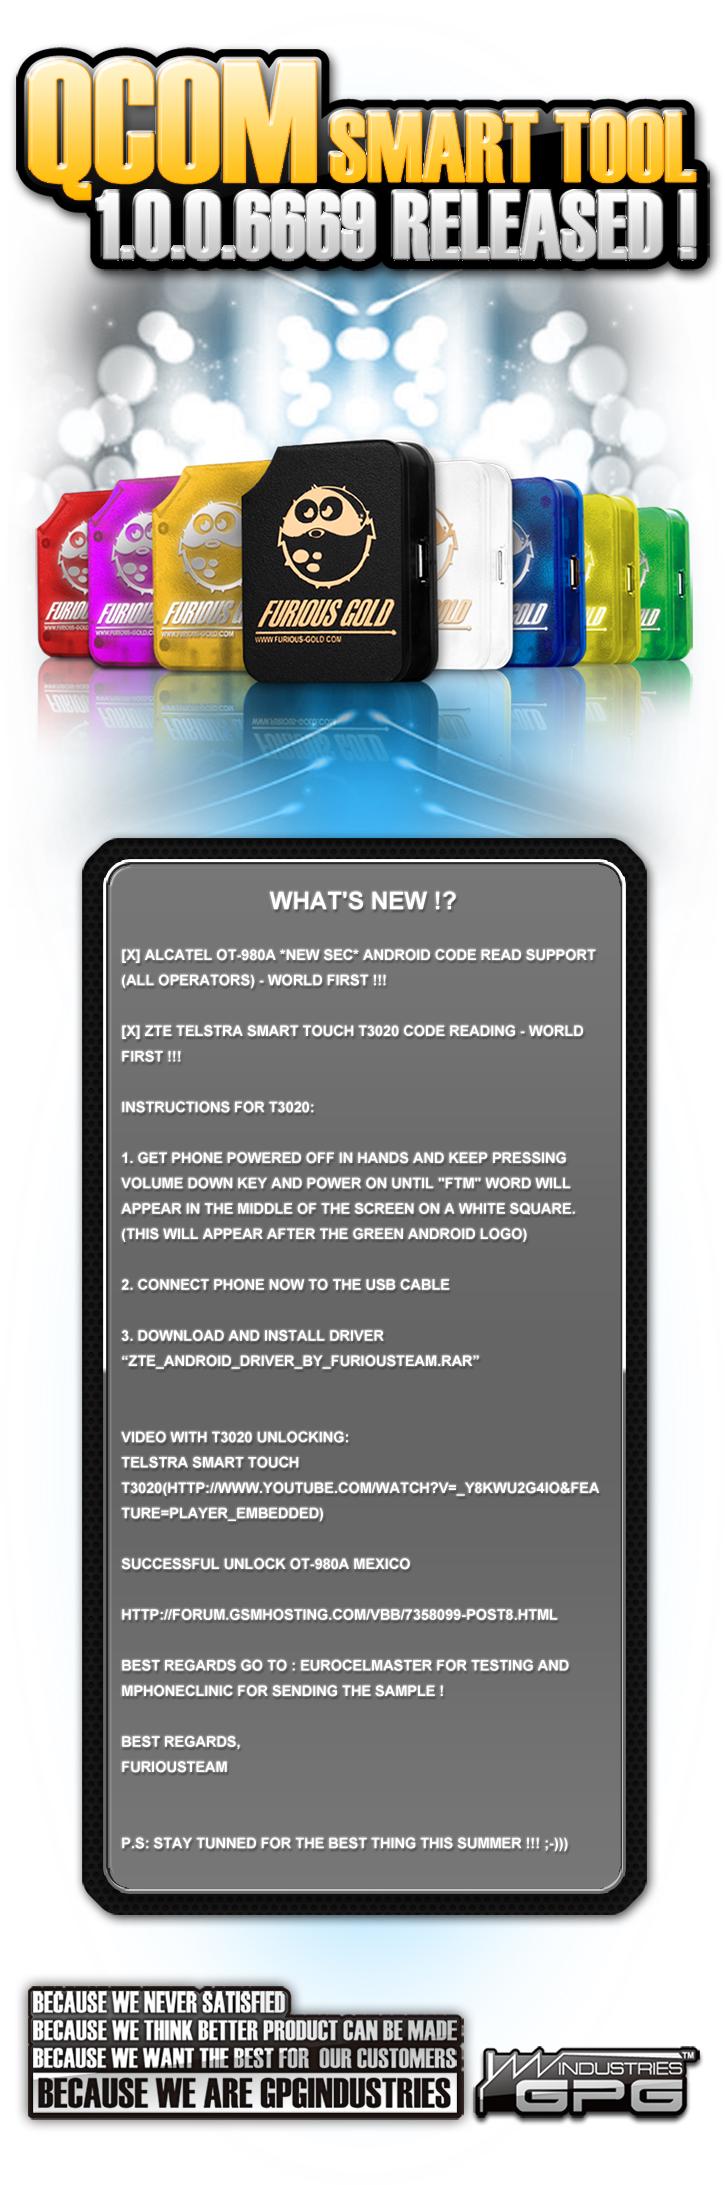 QCOM SMART TOOL 1.0.0.6669 Released !